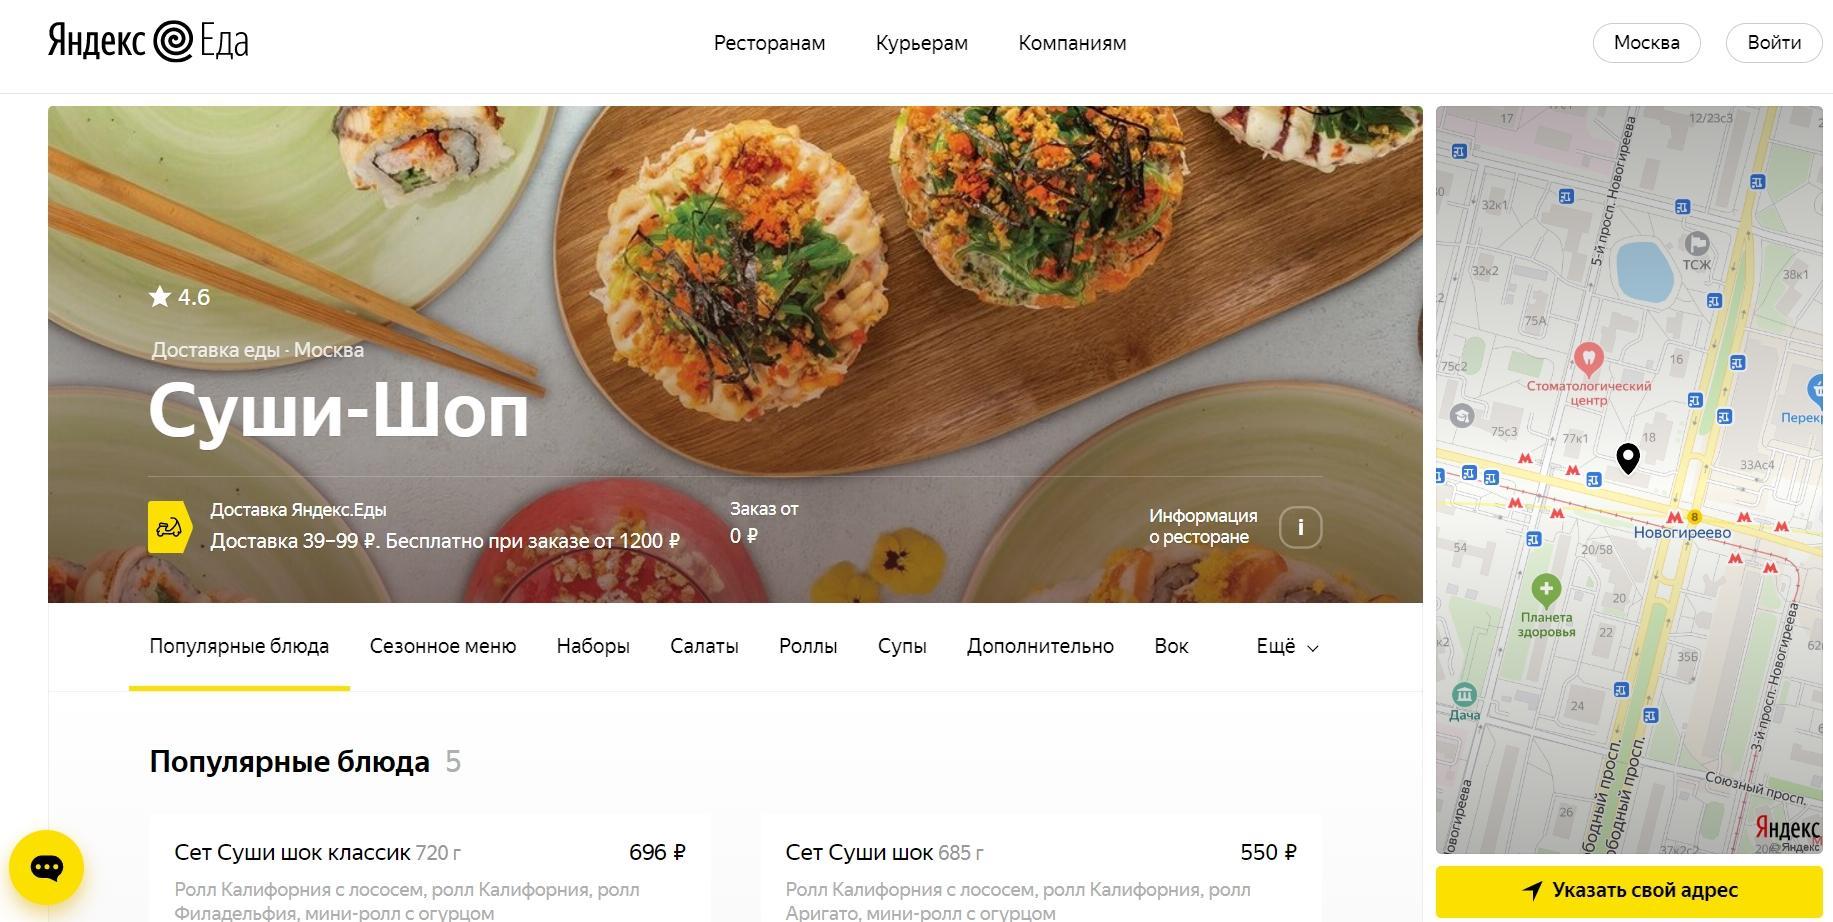 Оформление заказа через Яндекс.Еду